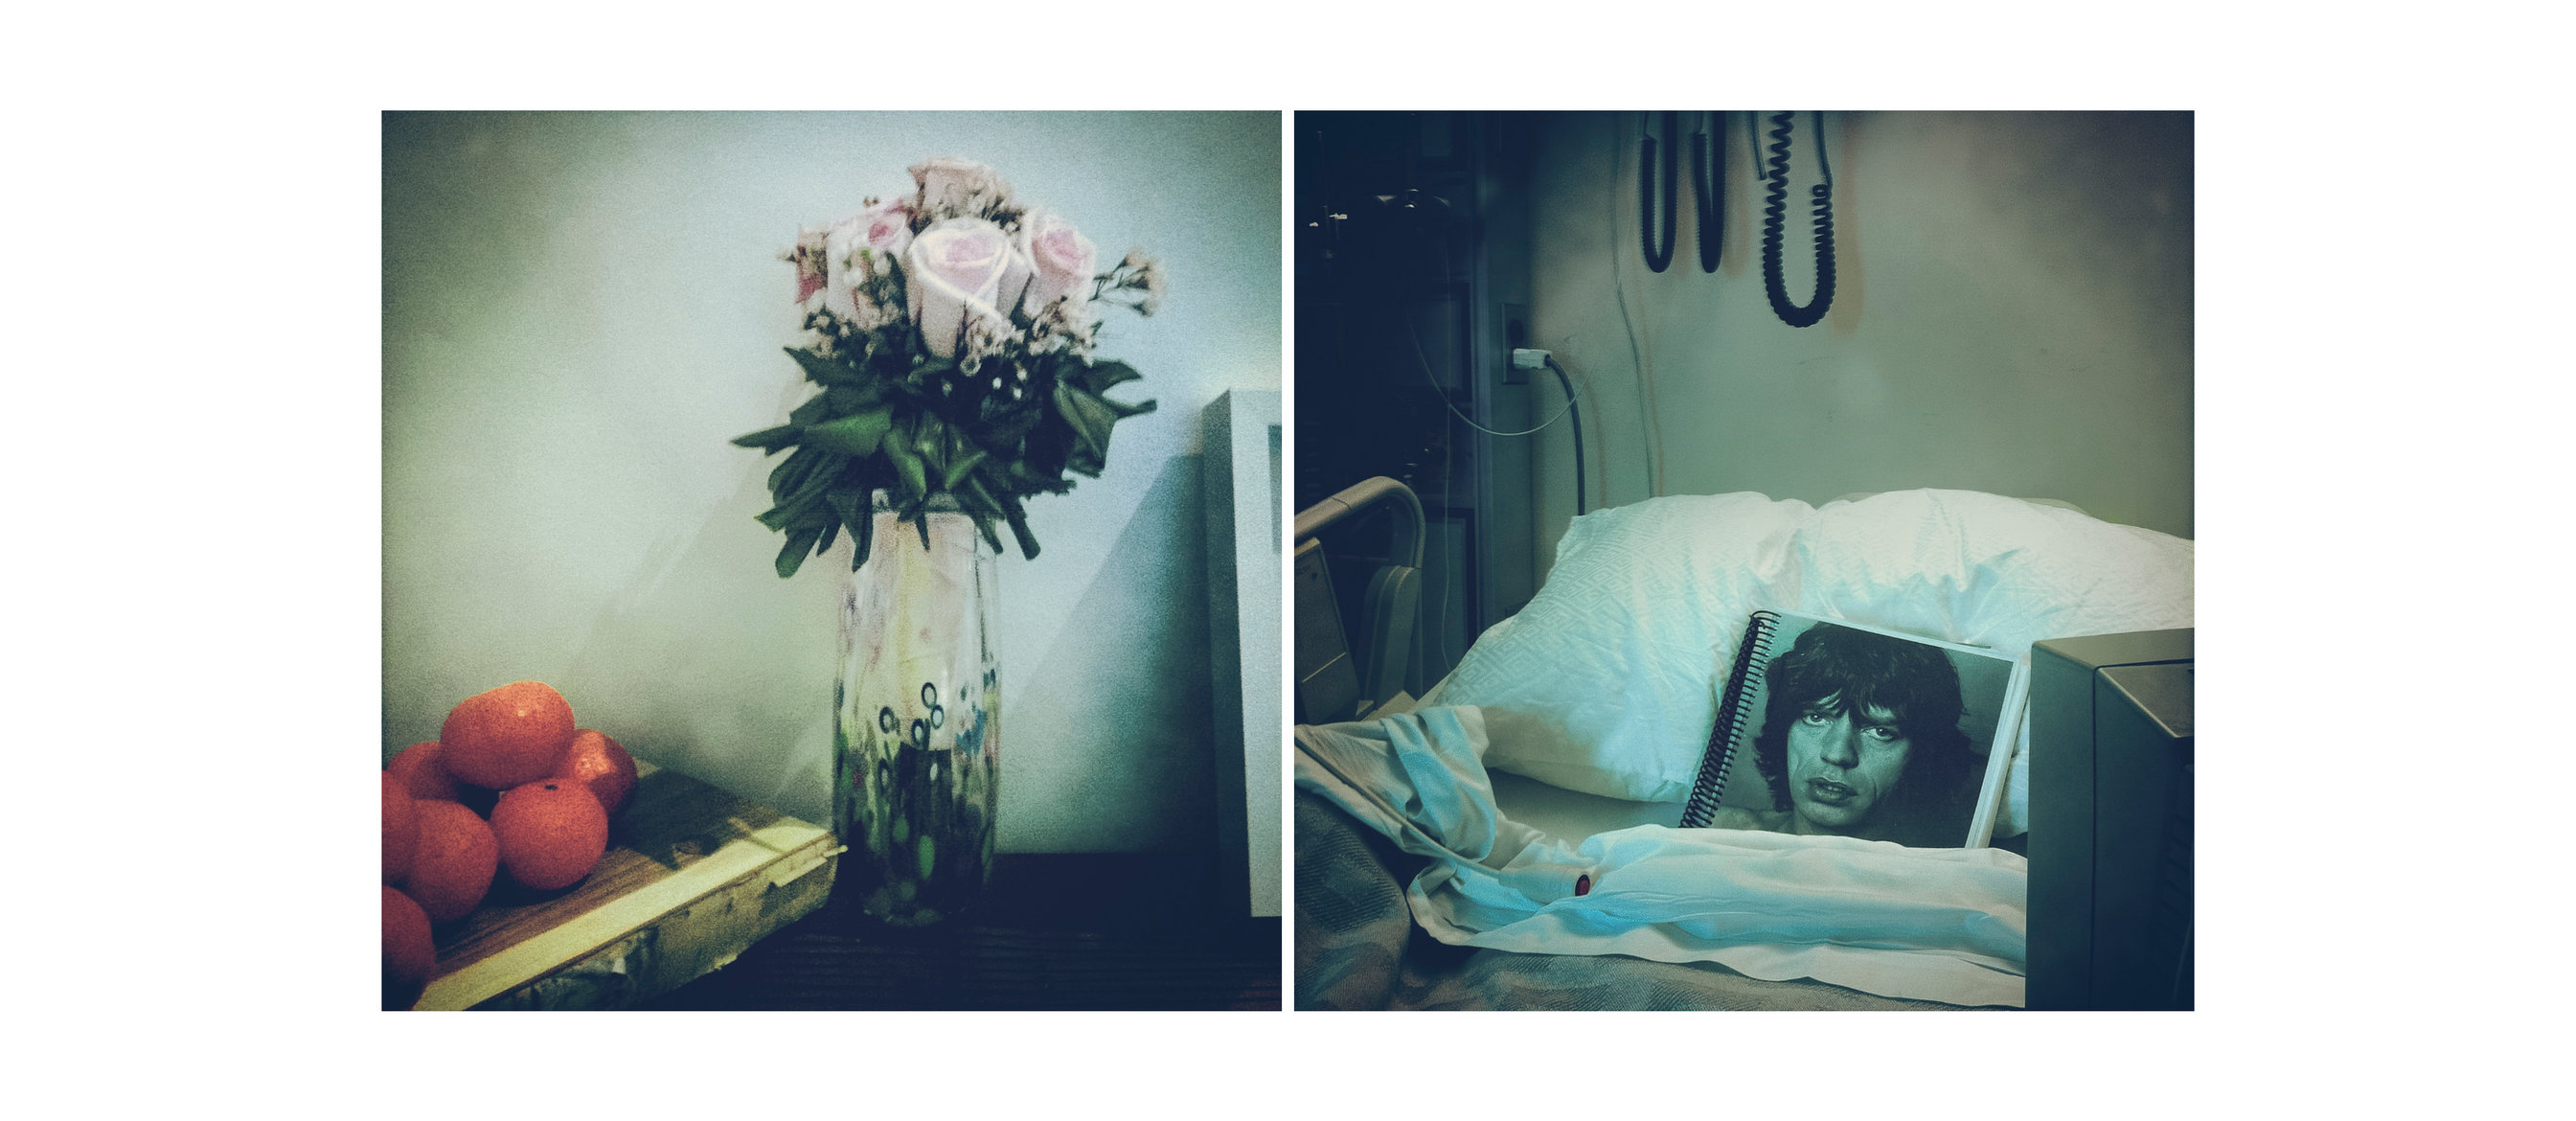 09_Flowers_Jagger.jpg